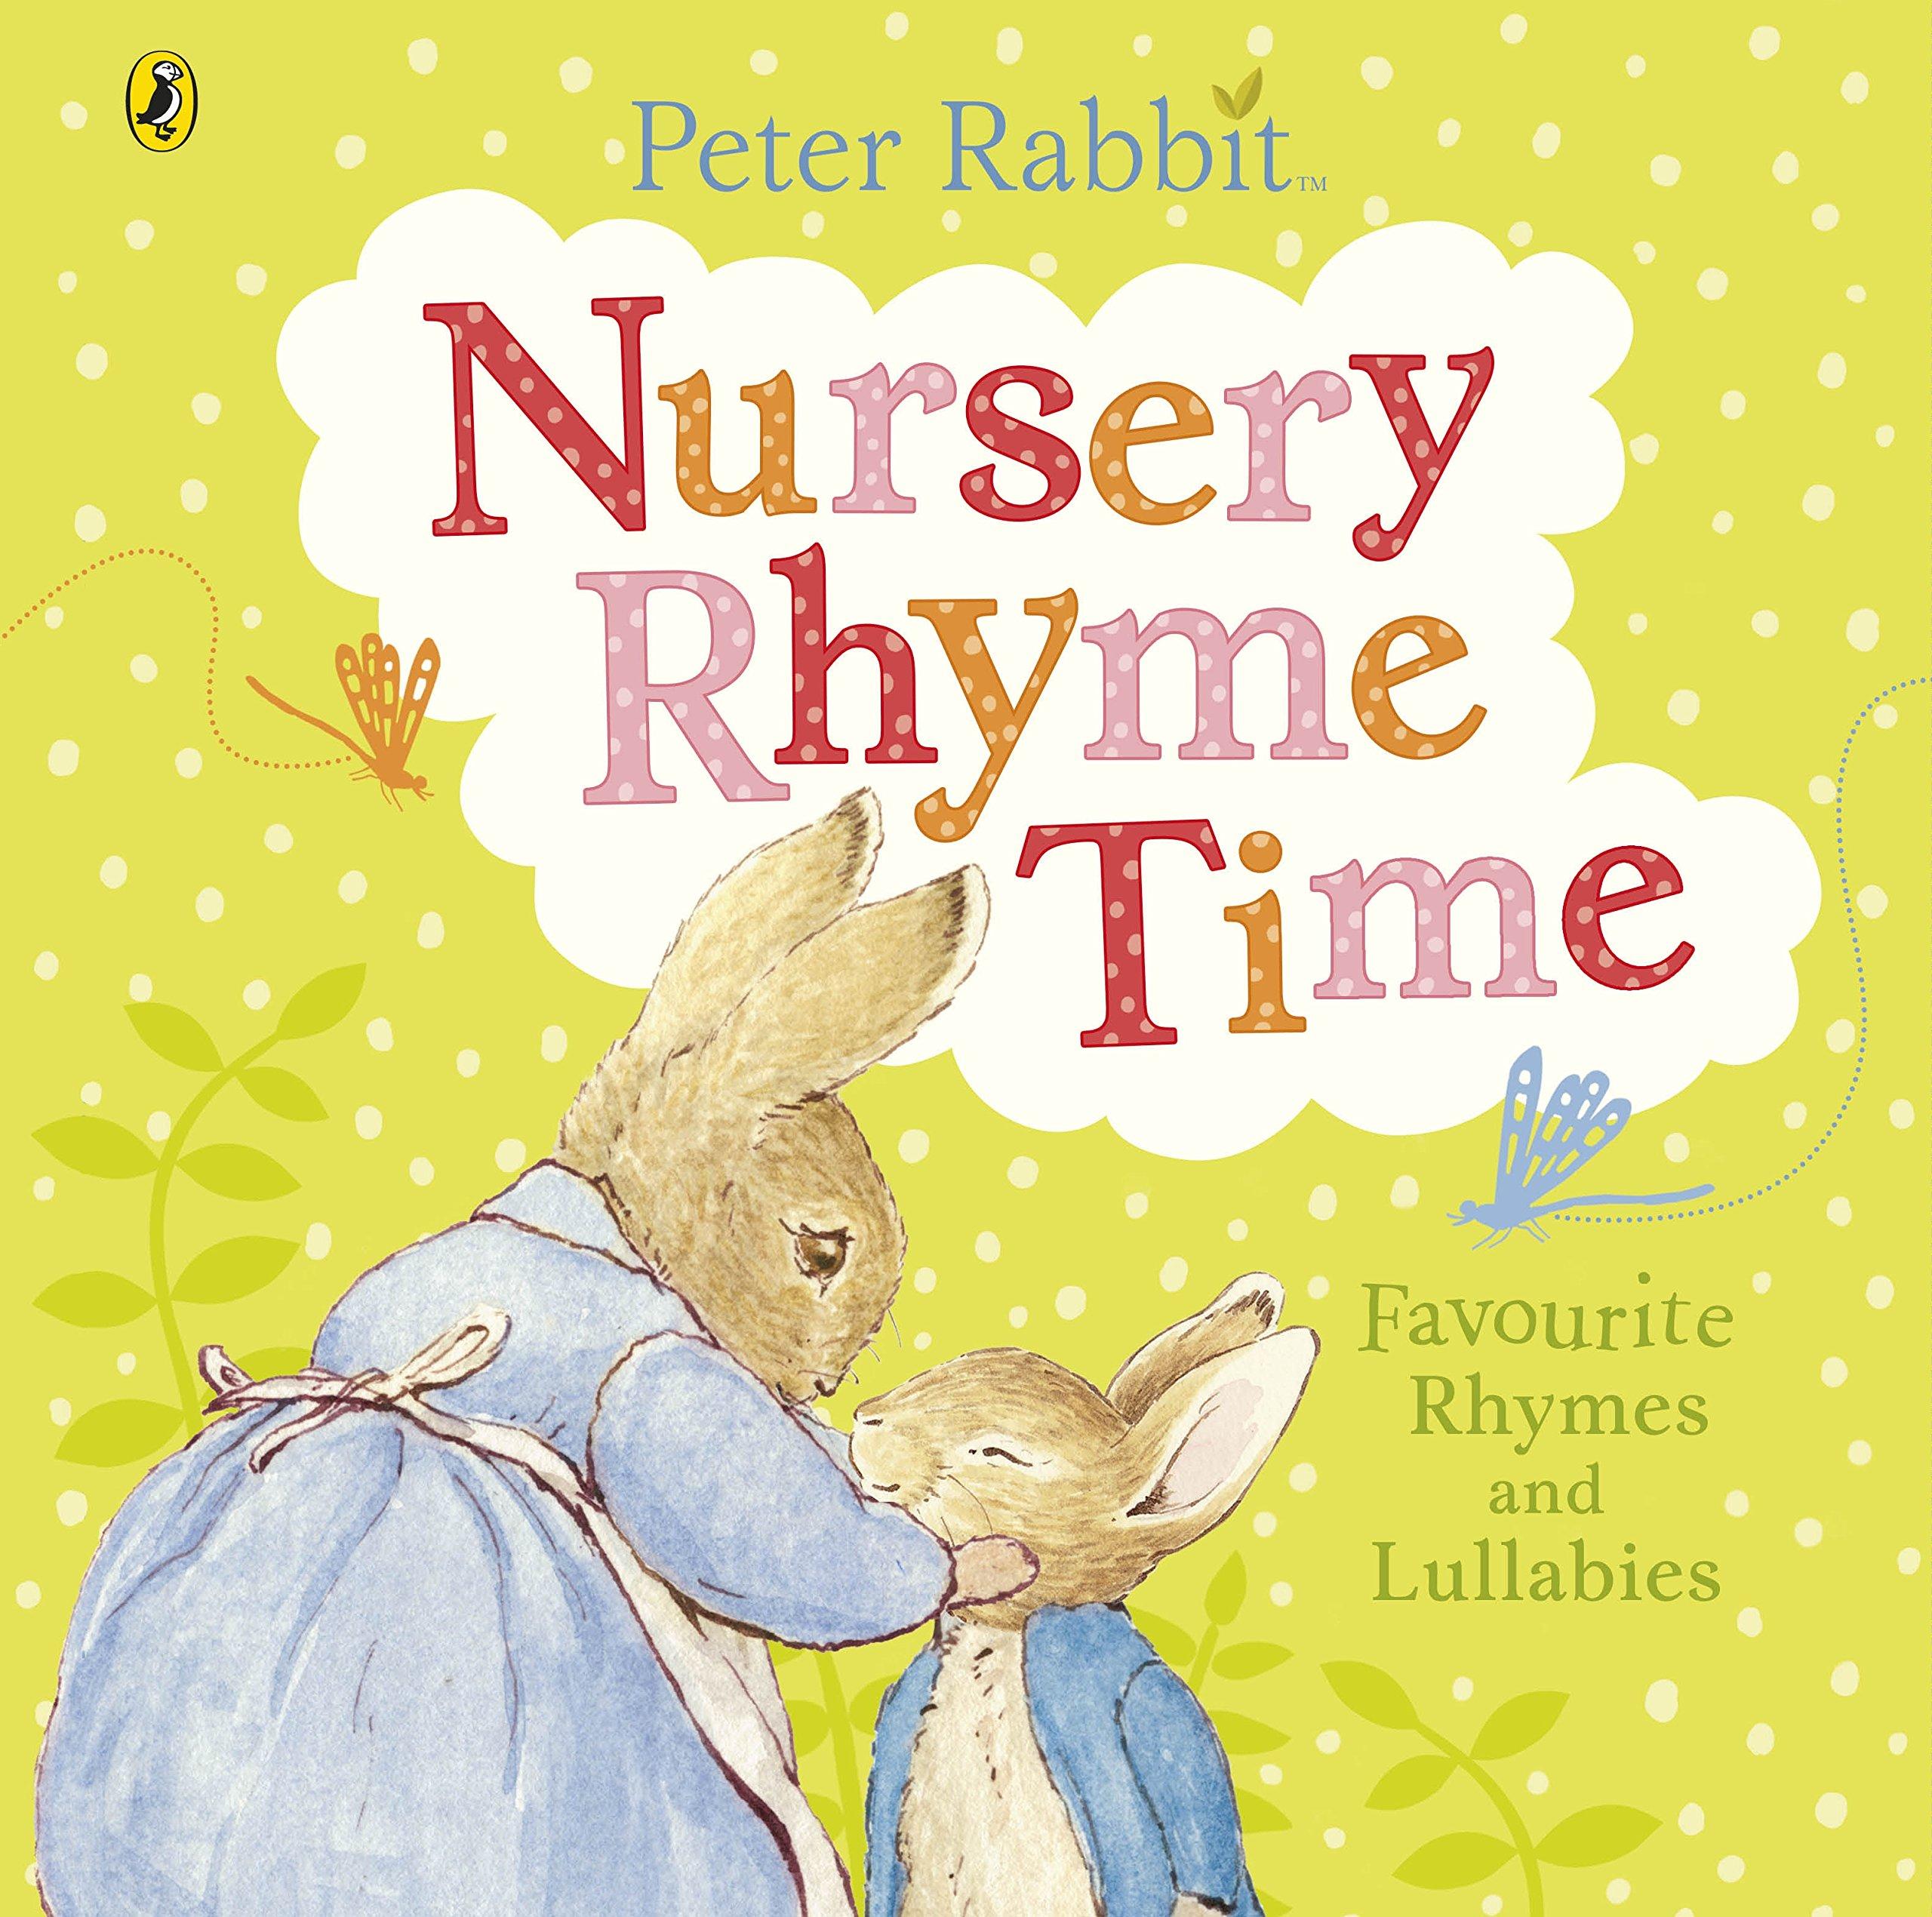 peter rabbit nursery peter rabbit name picture print art peter rabbit nursery rhyme time pr baby books amazoncouk beatrix potter books